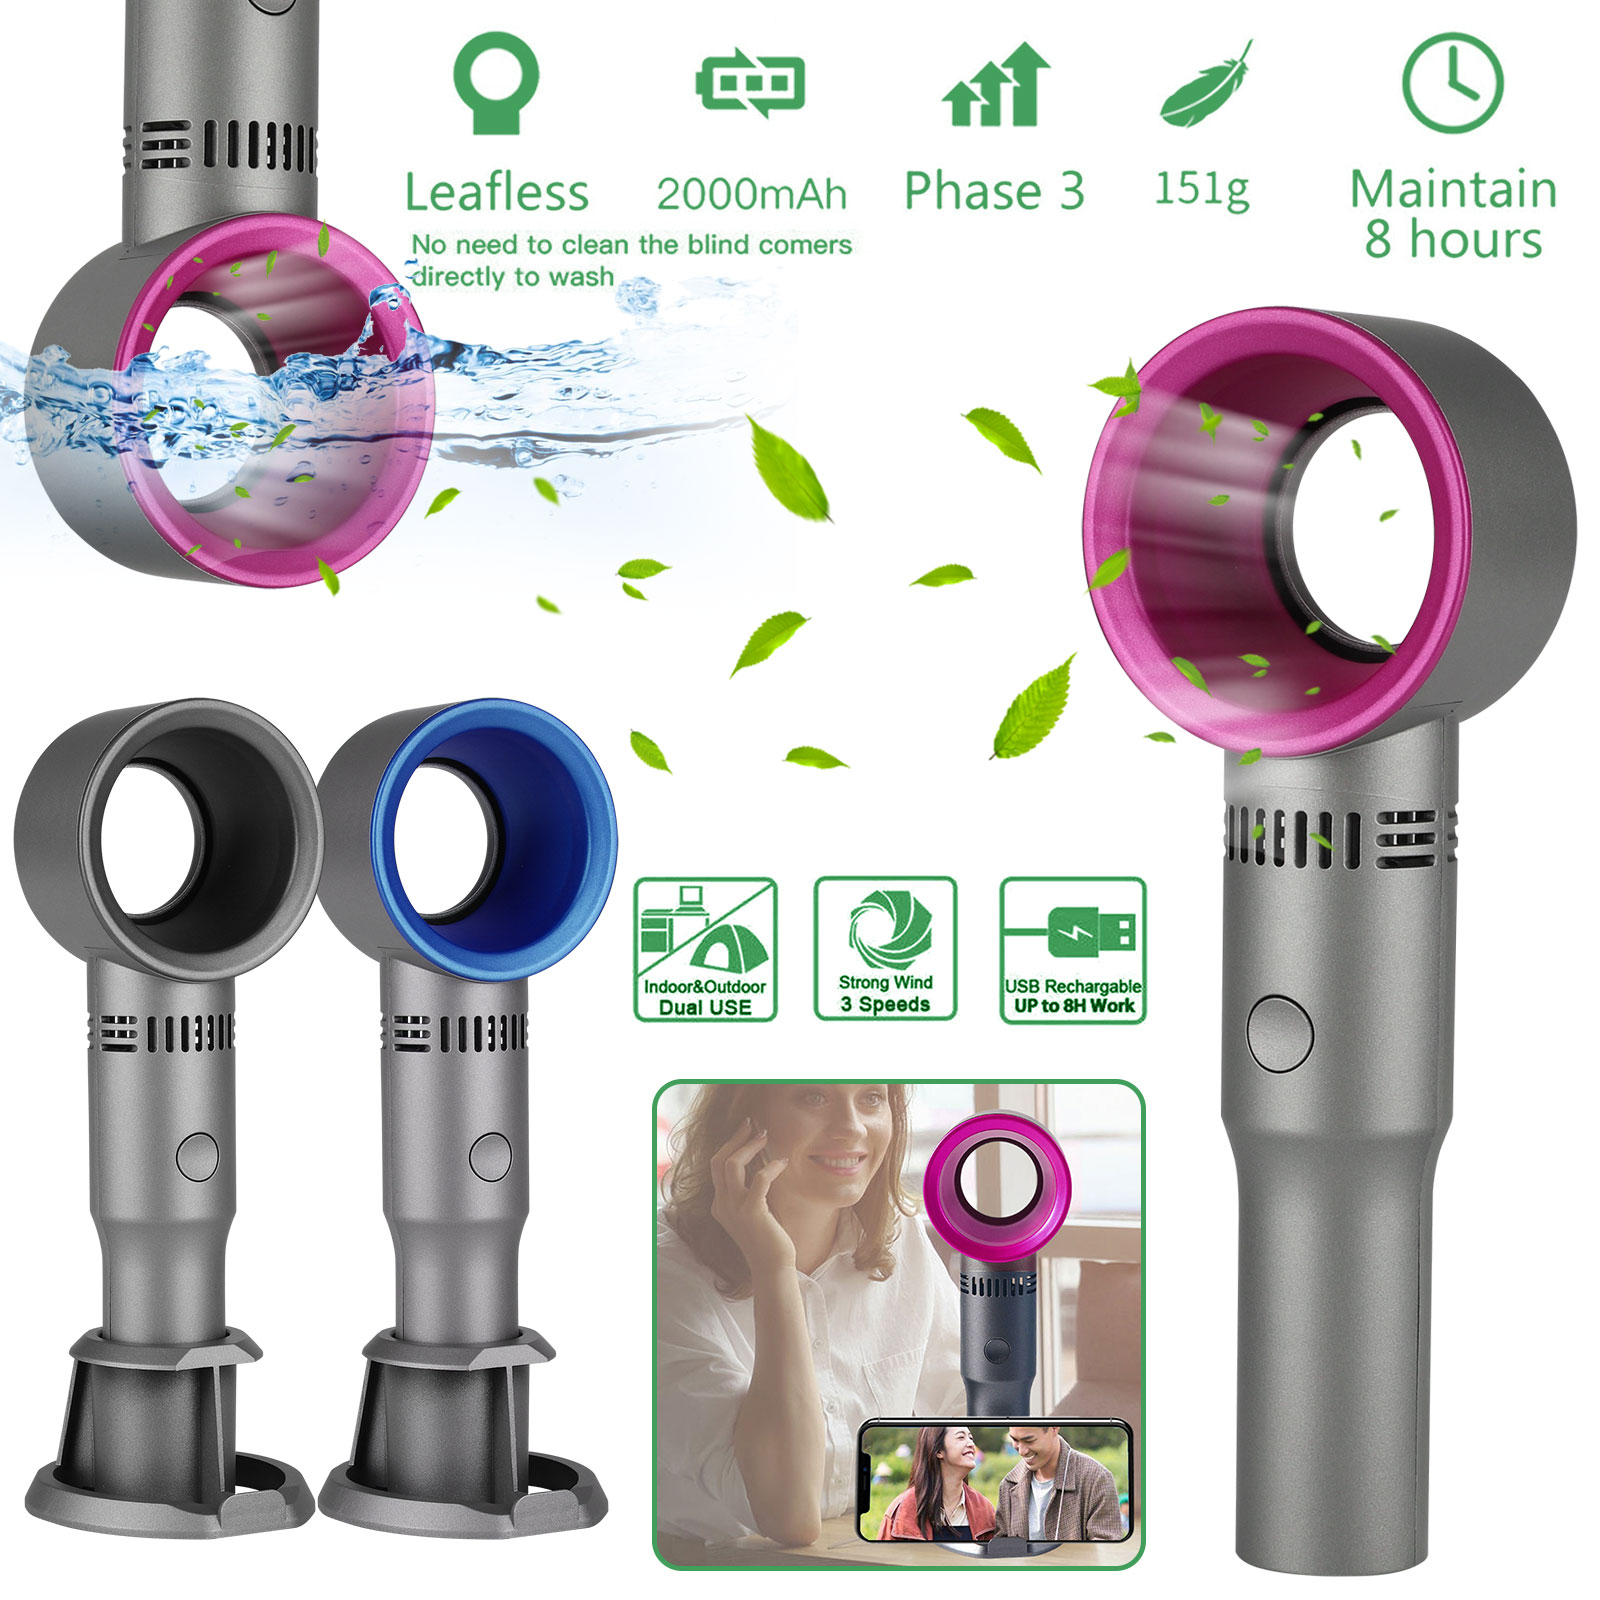 Bladeless Handheld Fan USB Rechargeable 3 Speeds Mini Cooler for Outdoor Travel